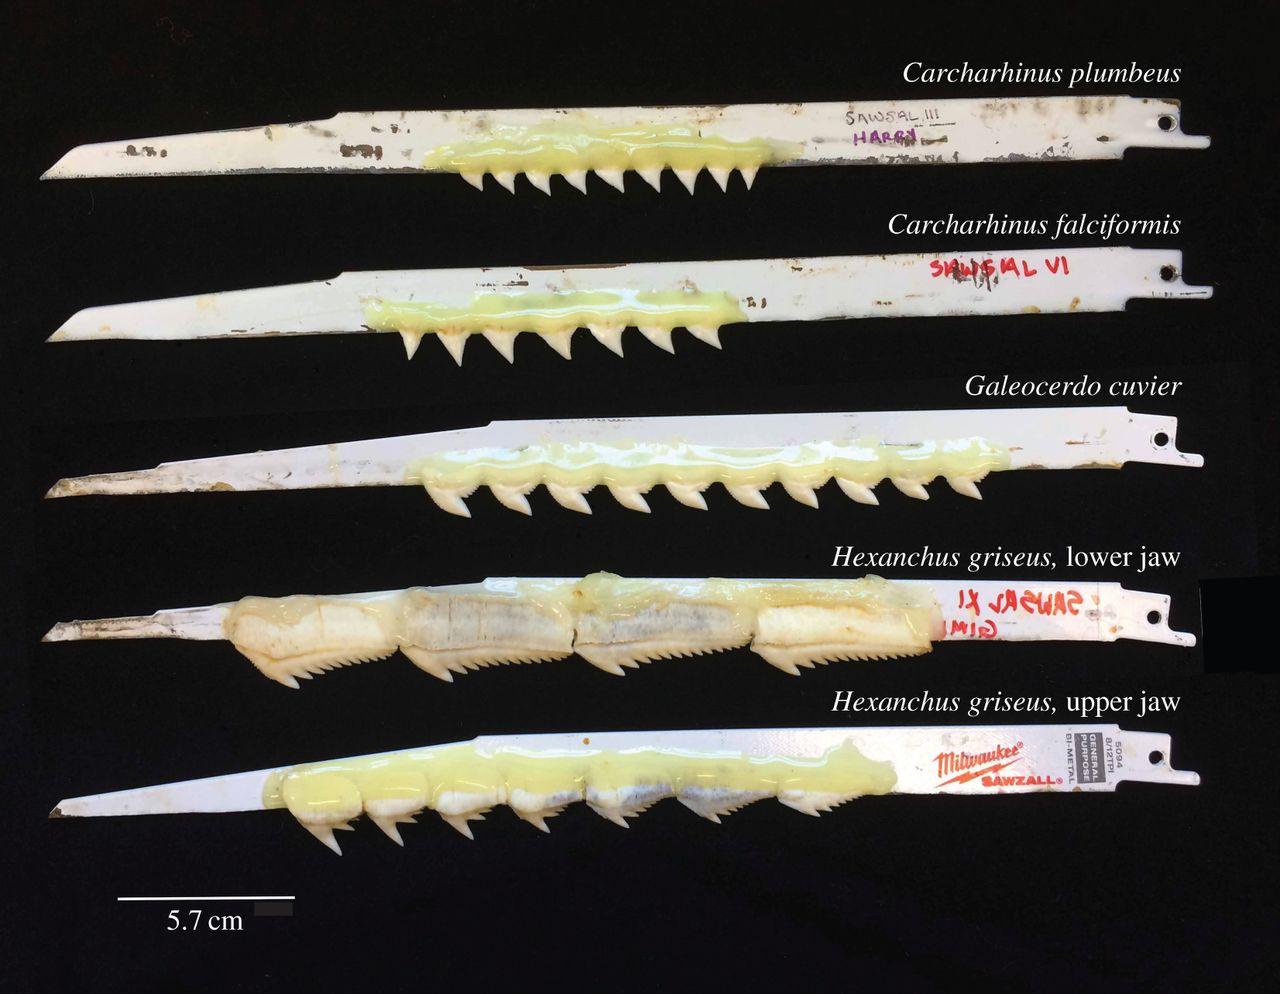 How Do Shark Teeth Bite Reciprocating Saw Glue Provide